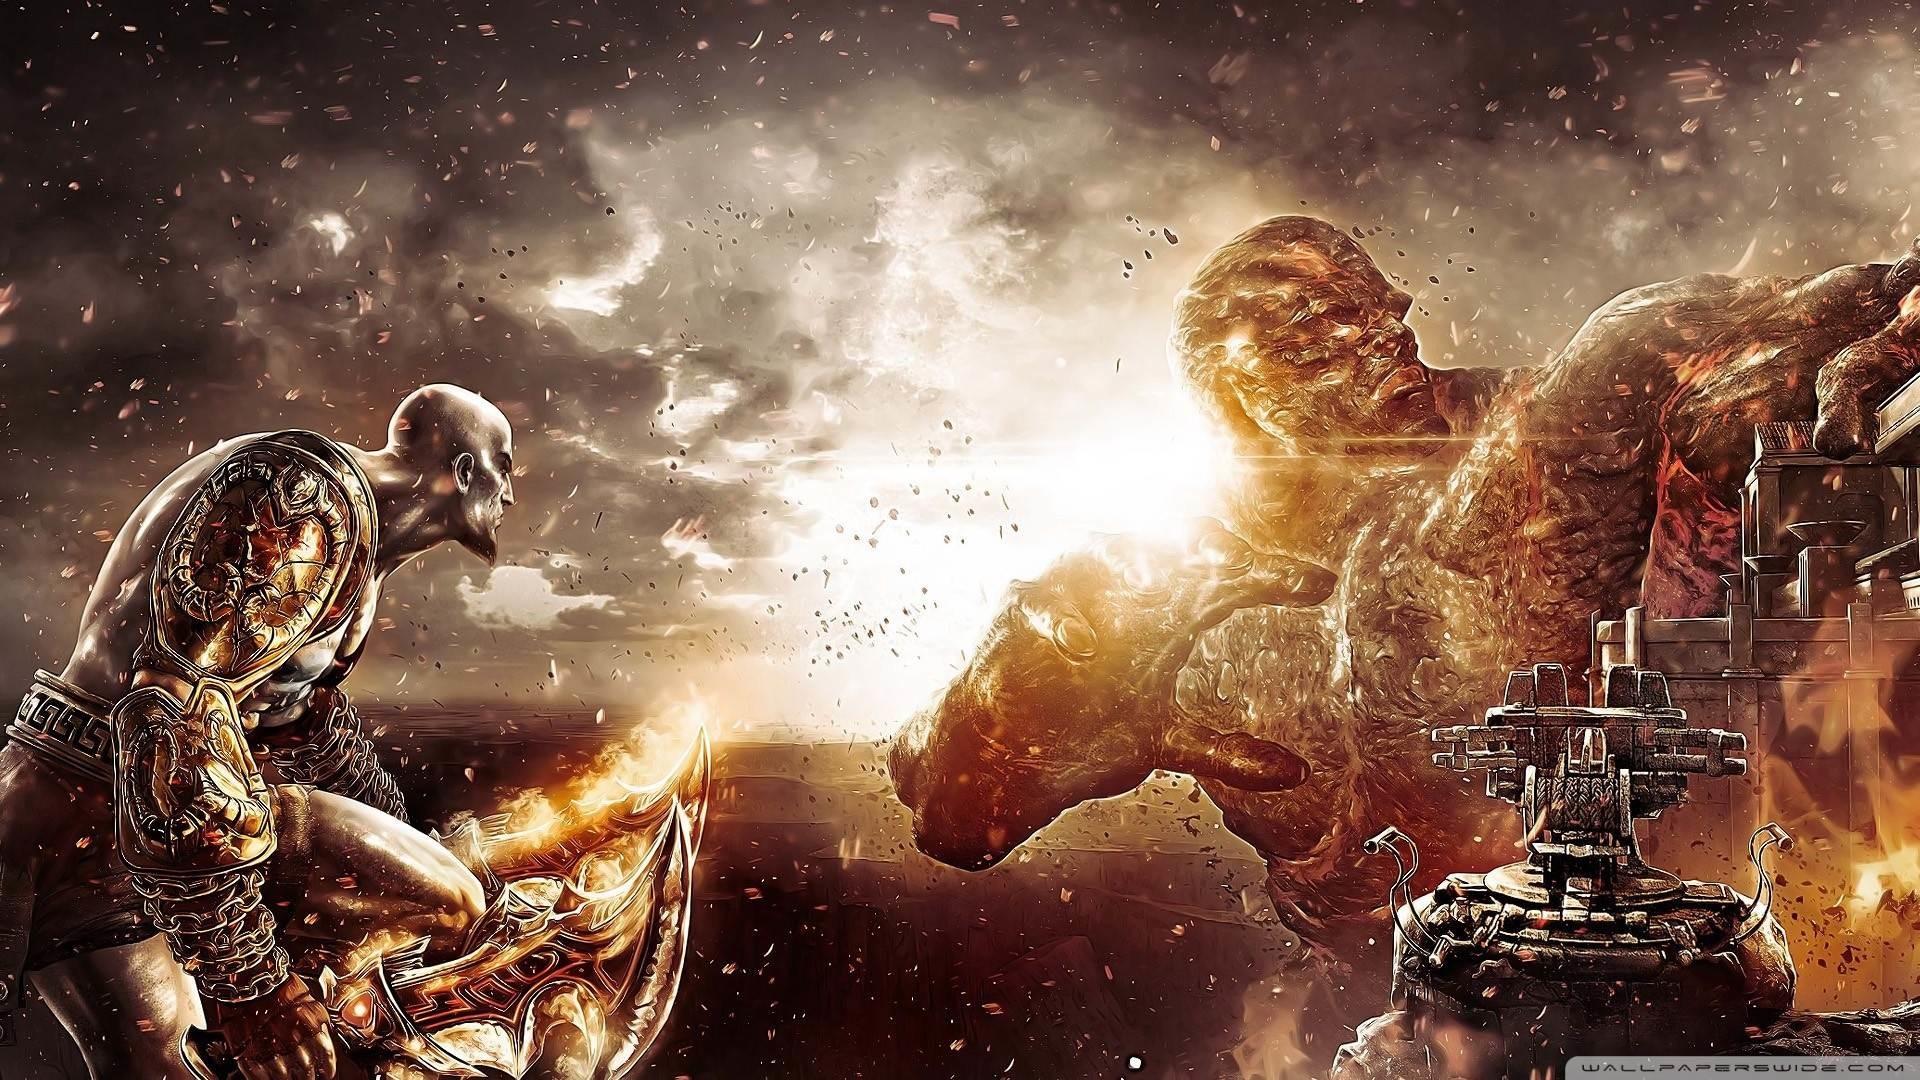 Games of War God Kratos Kratos god of war HD Wallpapers, Desktop 1920×1080